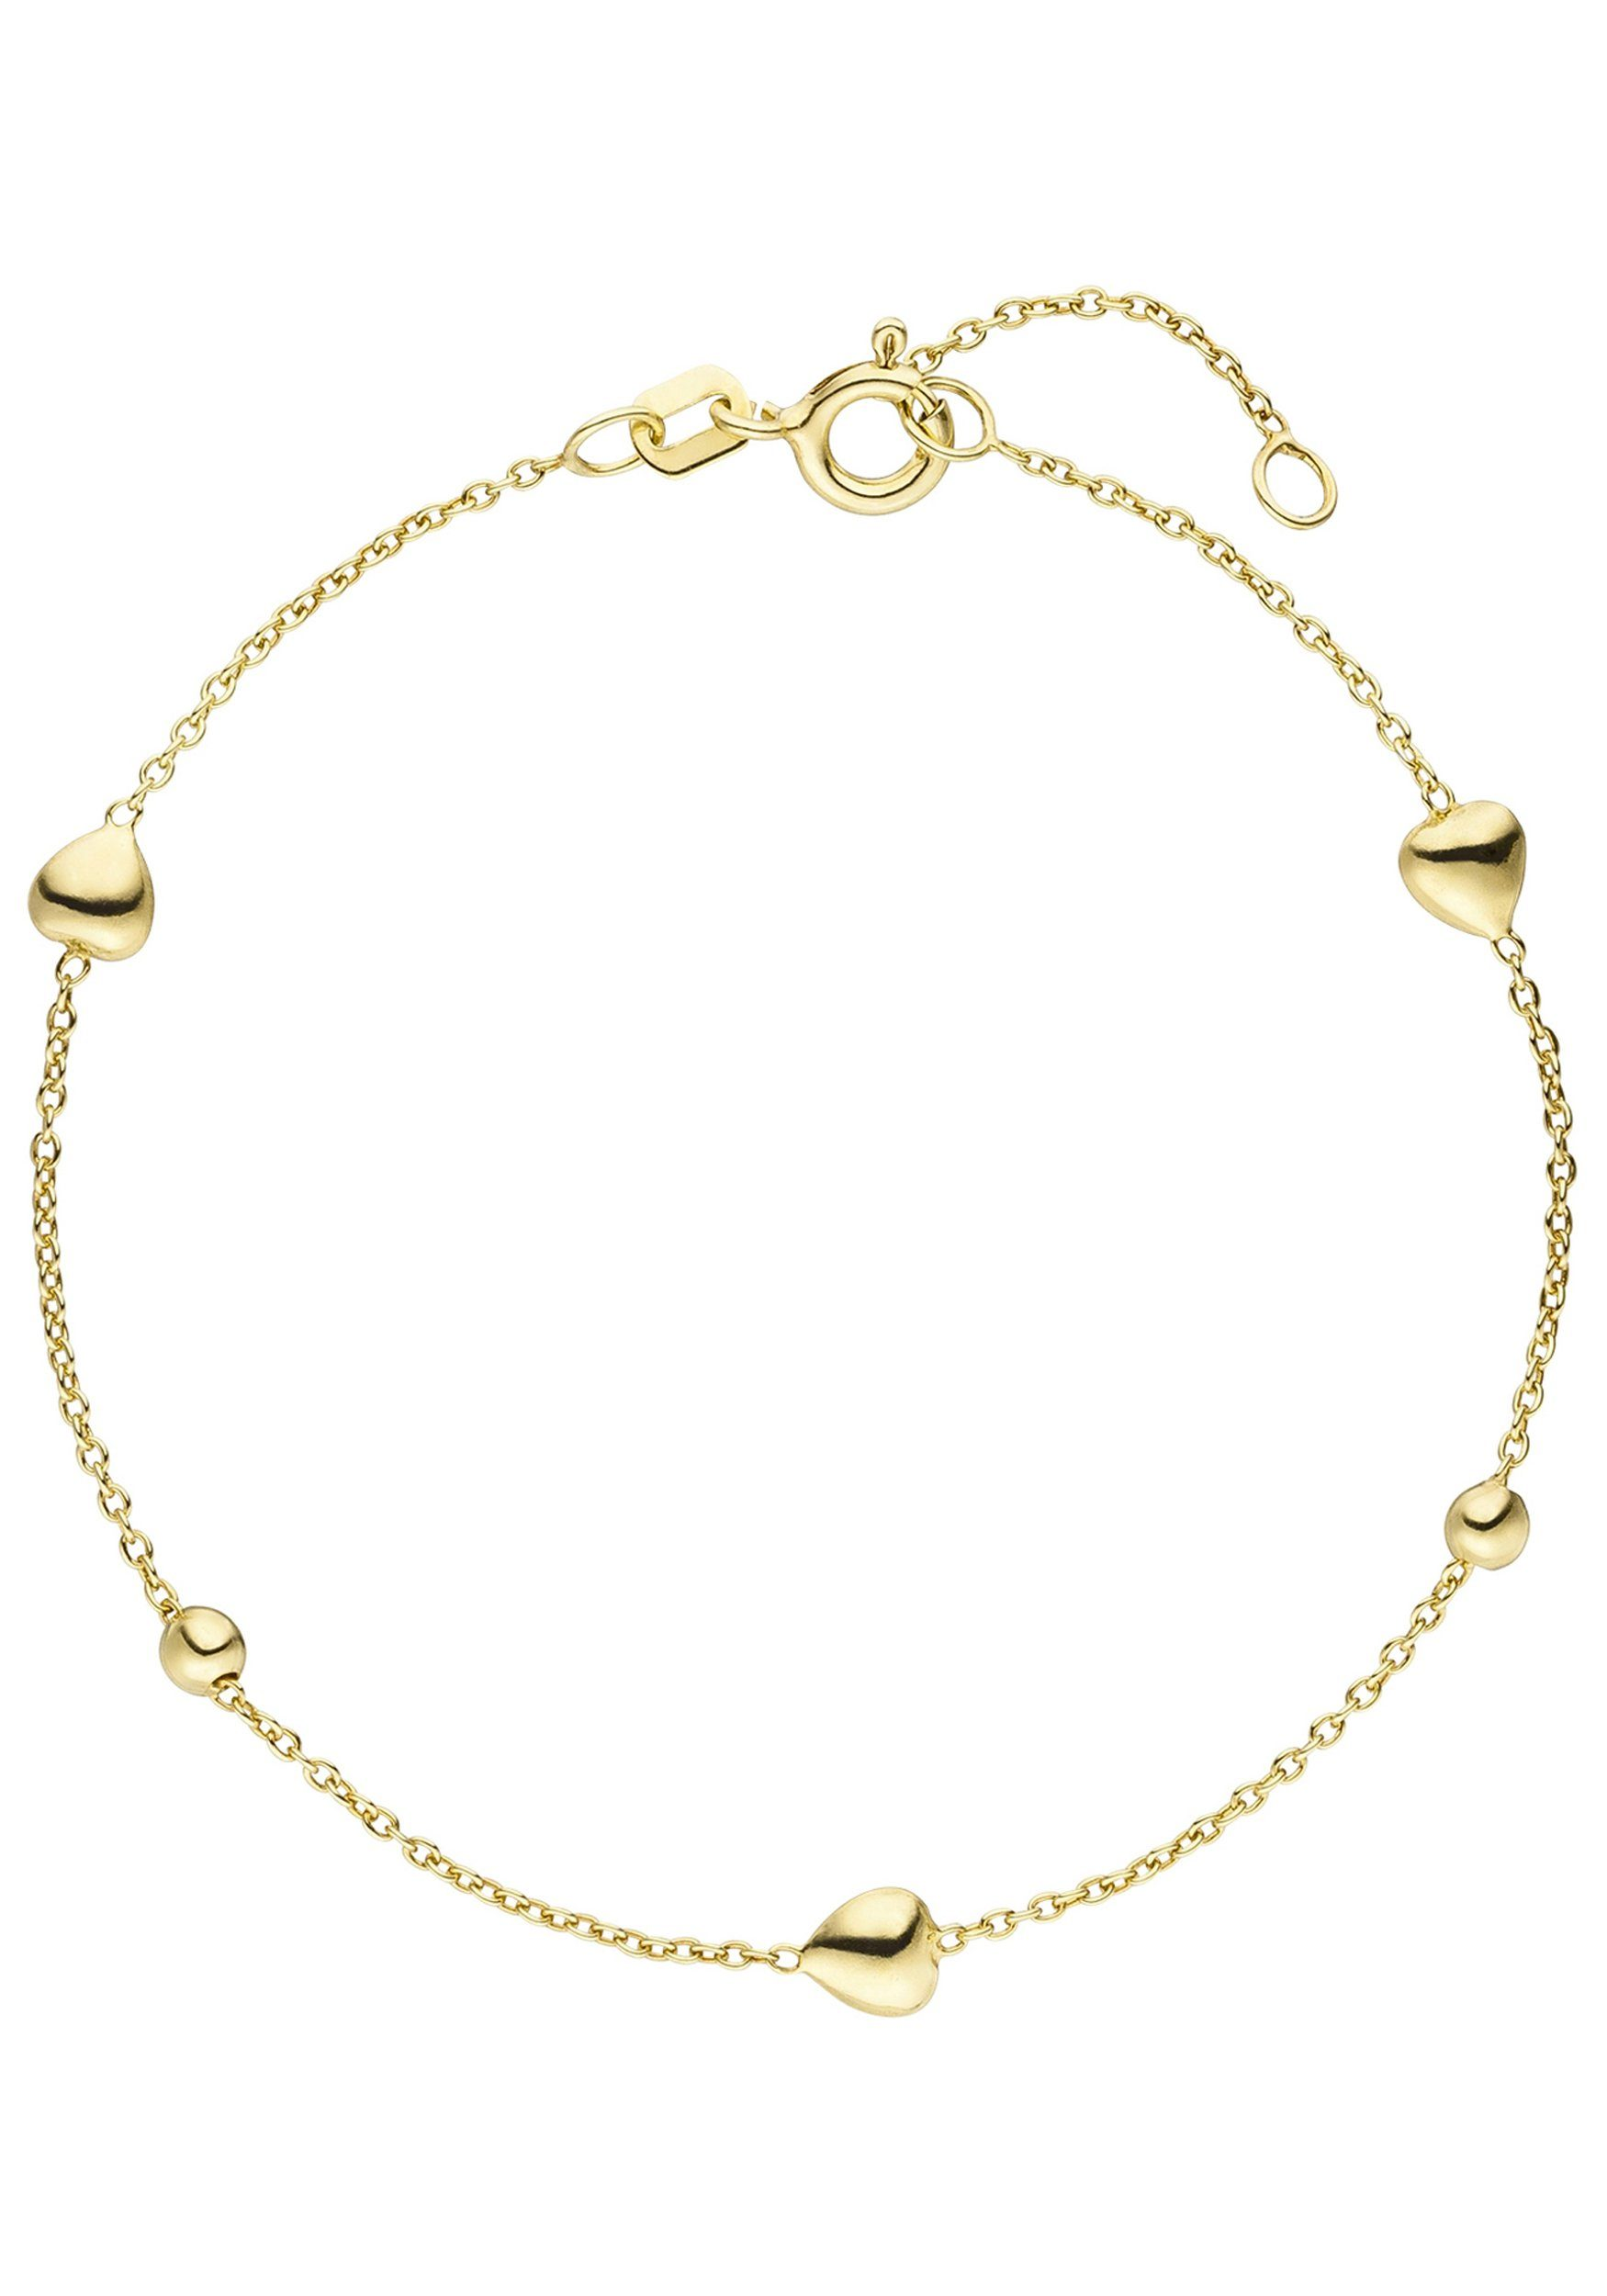 Kugel« »herz 925 Vergoldet Online Armband 19 Jobo Kaufen Silber Cm zMVpqSU